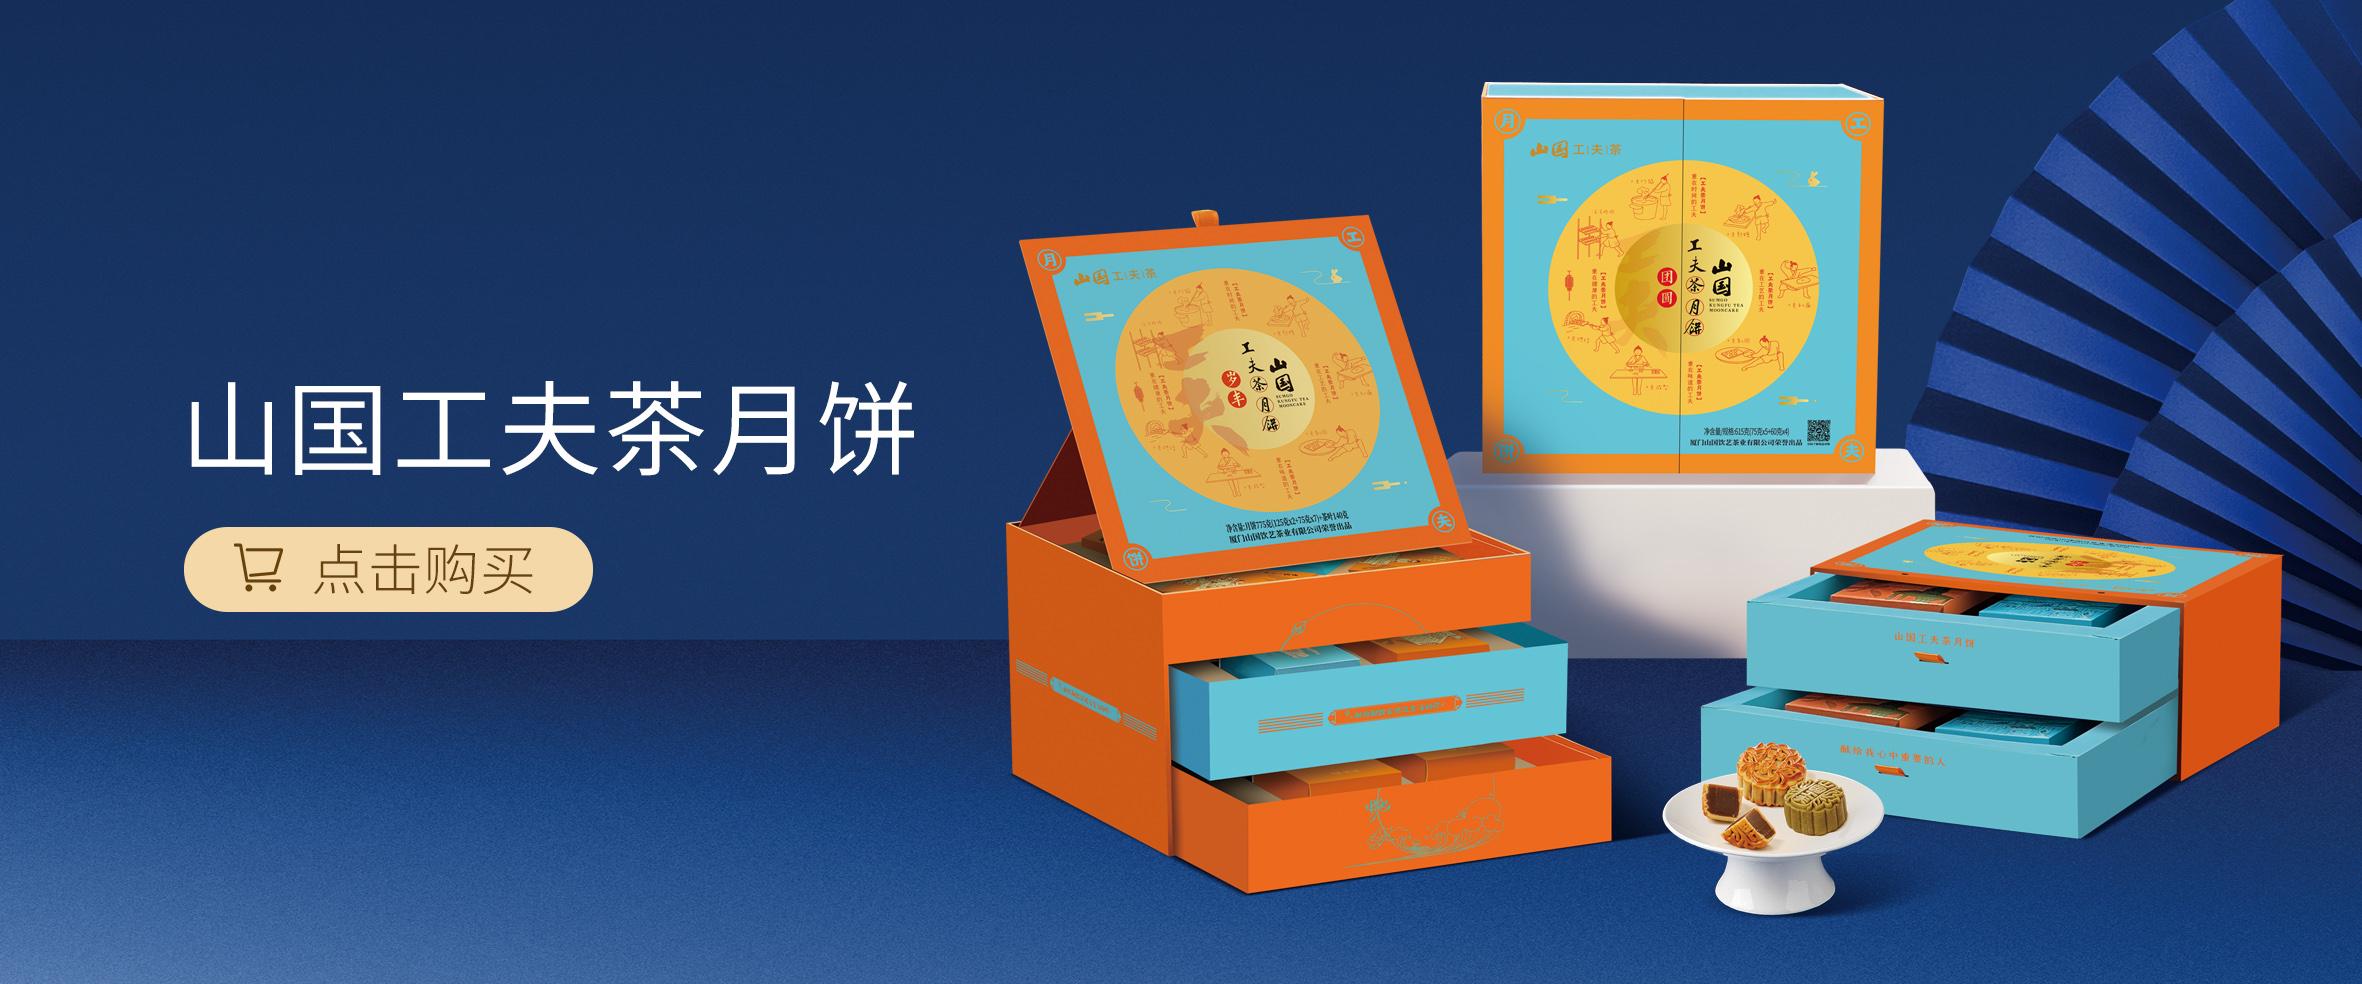 山国月饼系列banner